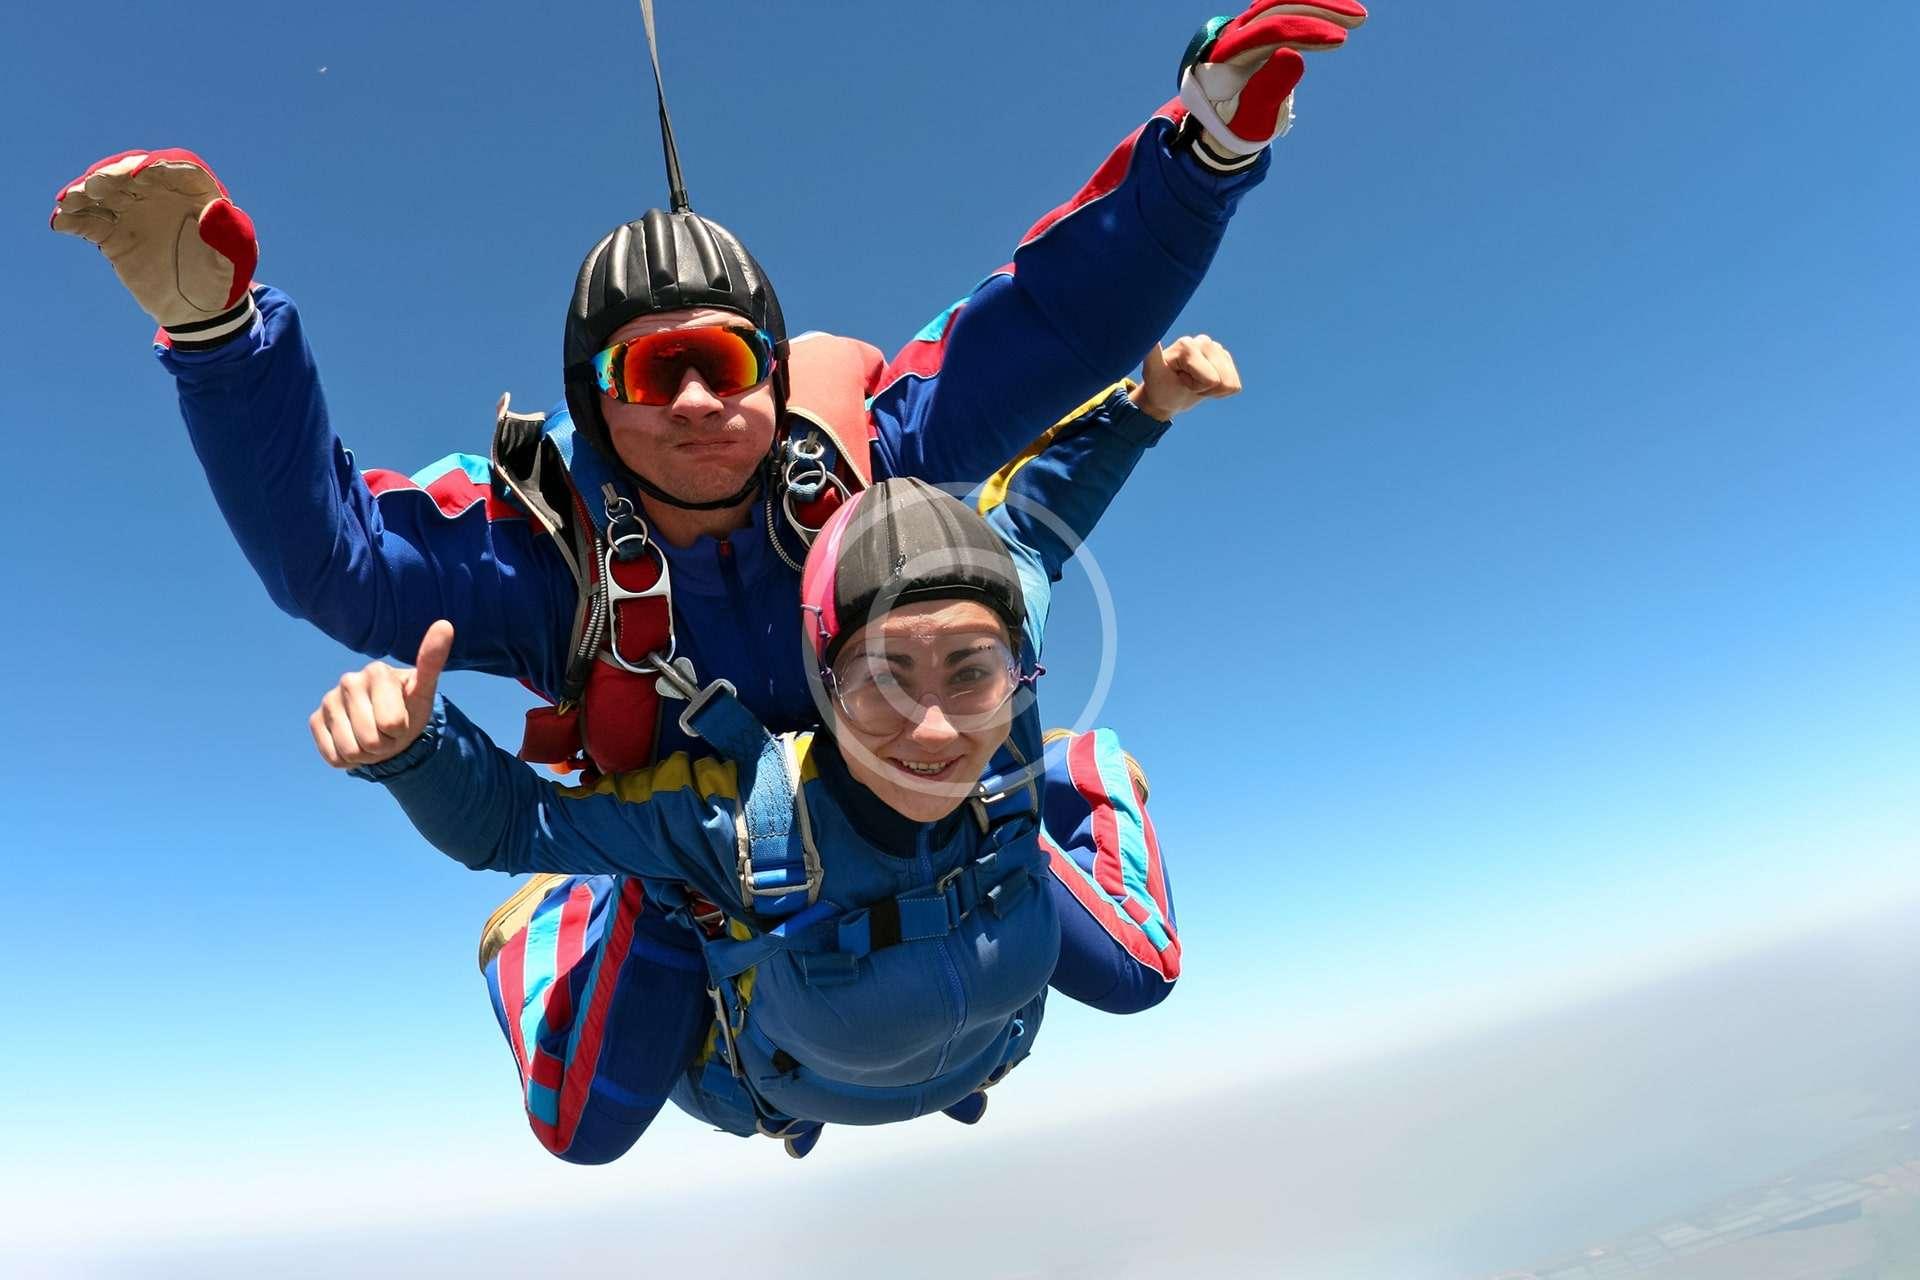 Go Tandem Skydiving